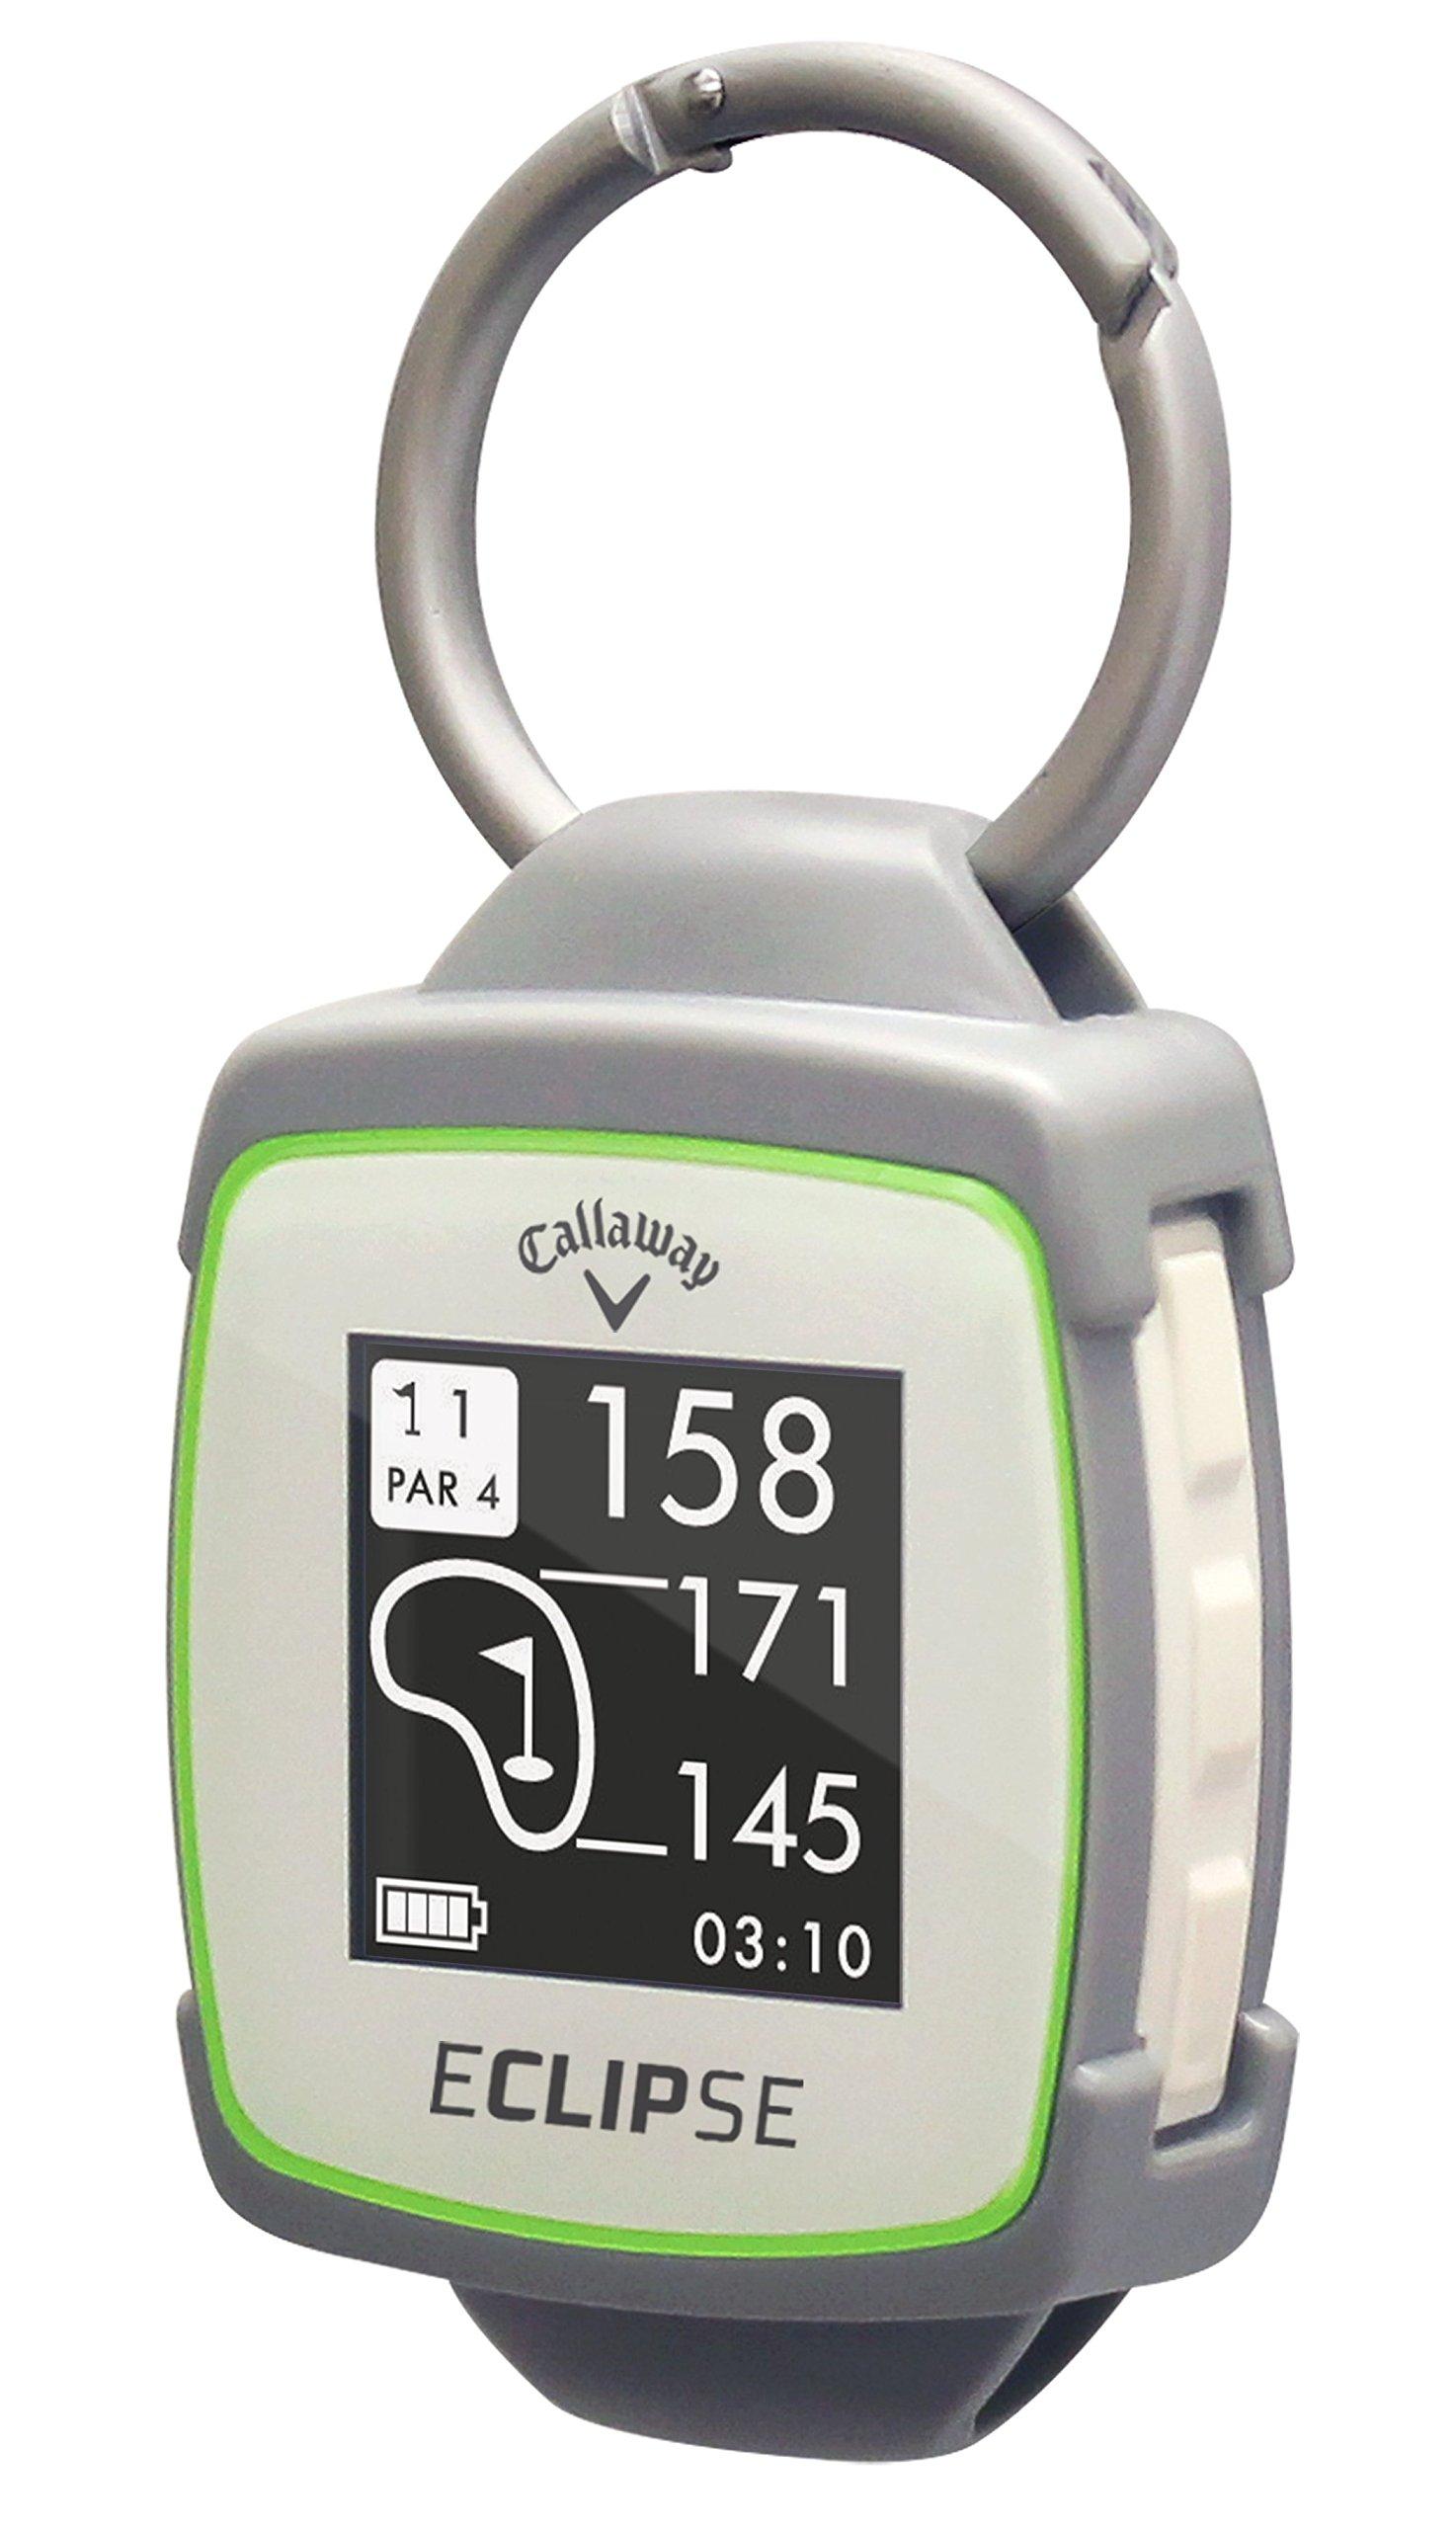 Callaway ECLIPSE Golf GPS, White